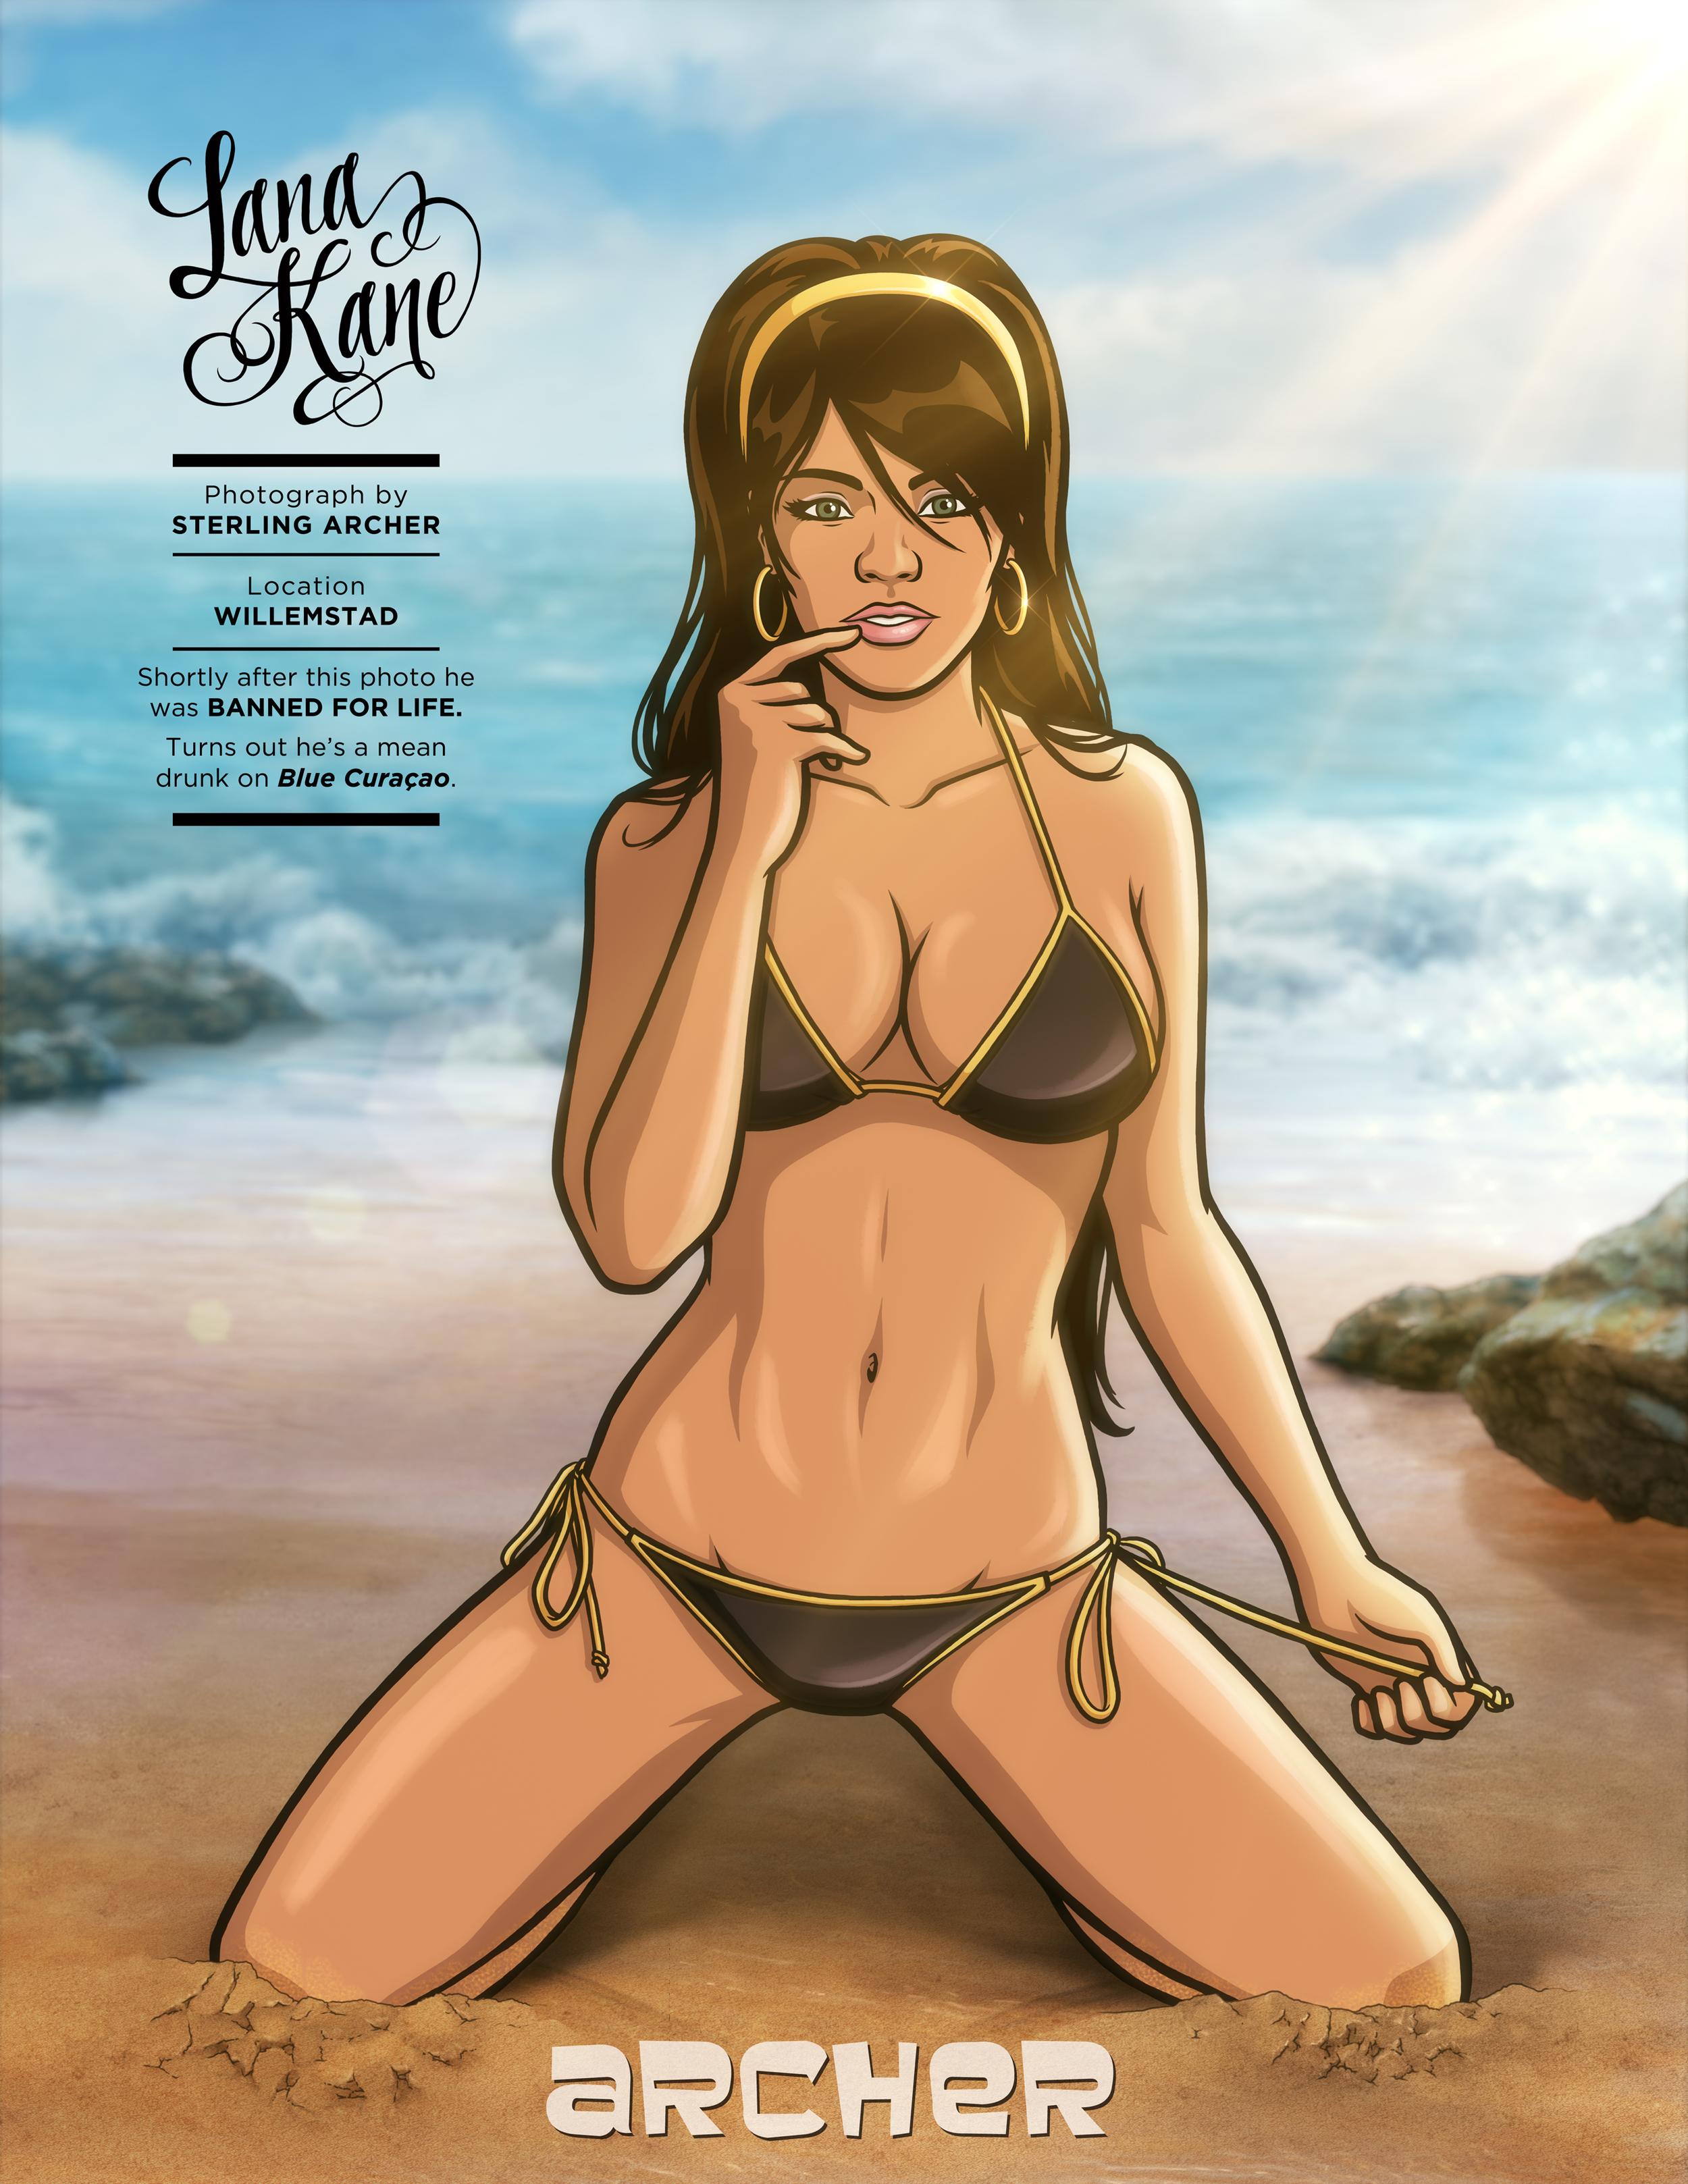 Sports Illustrated - Lana Kane